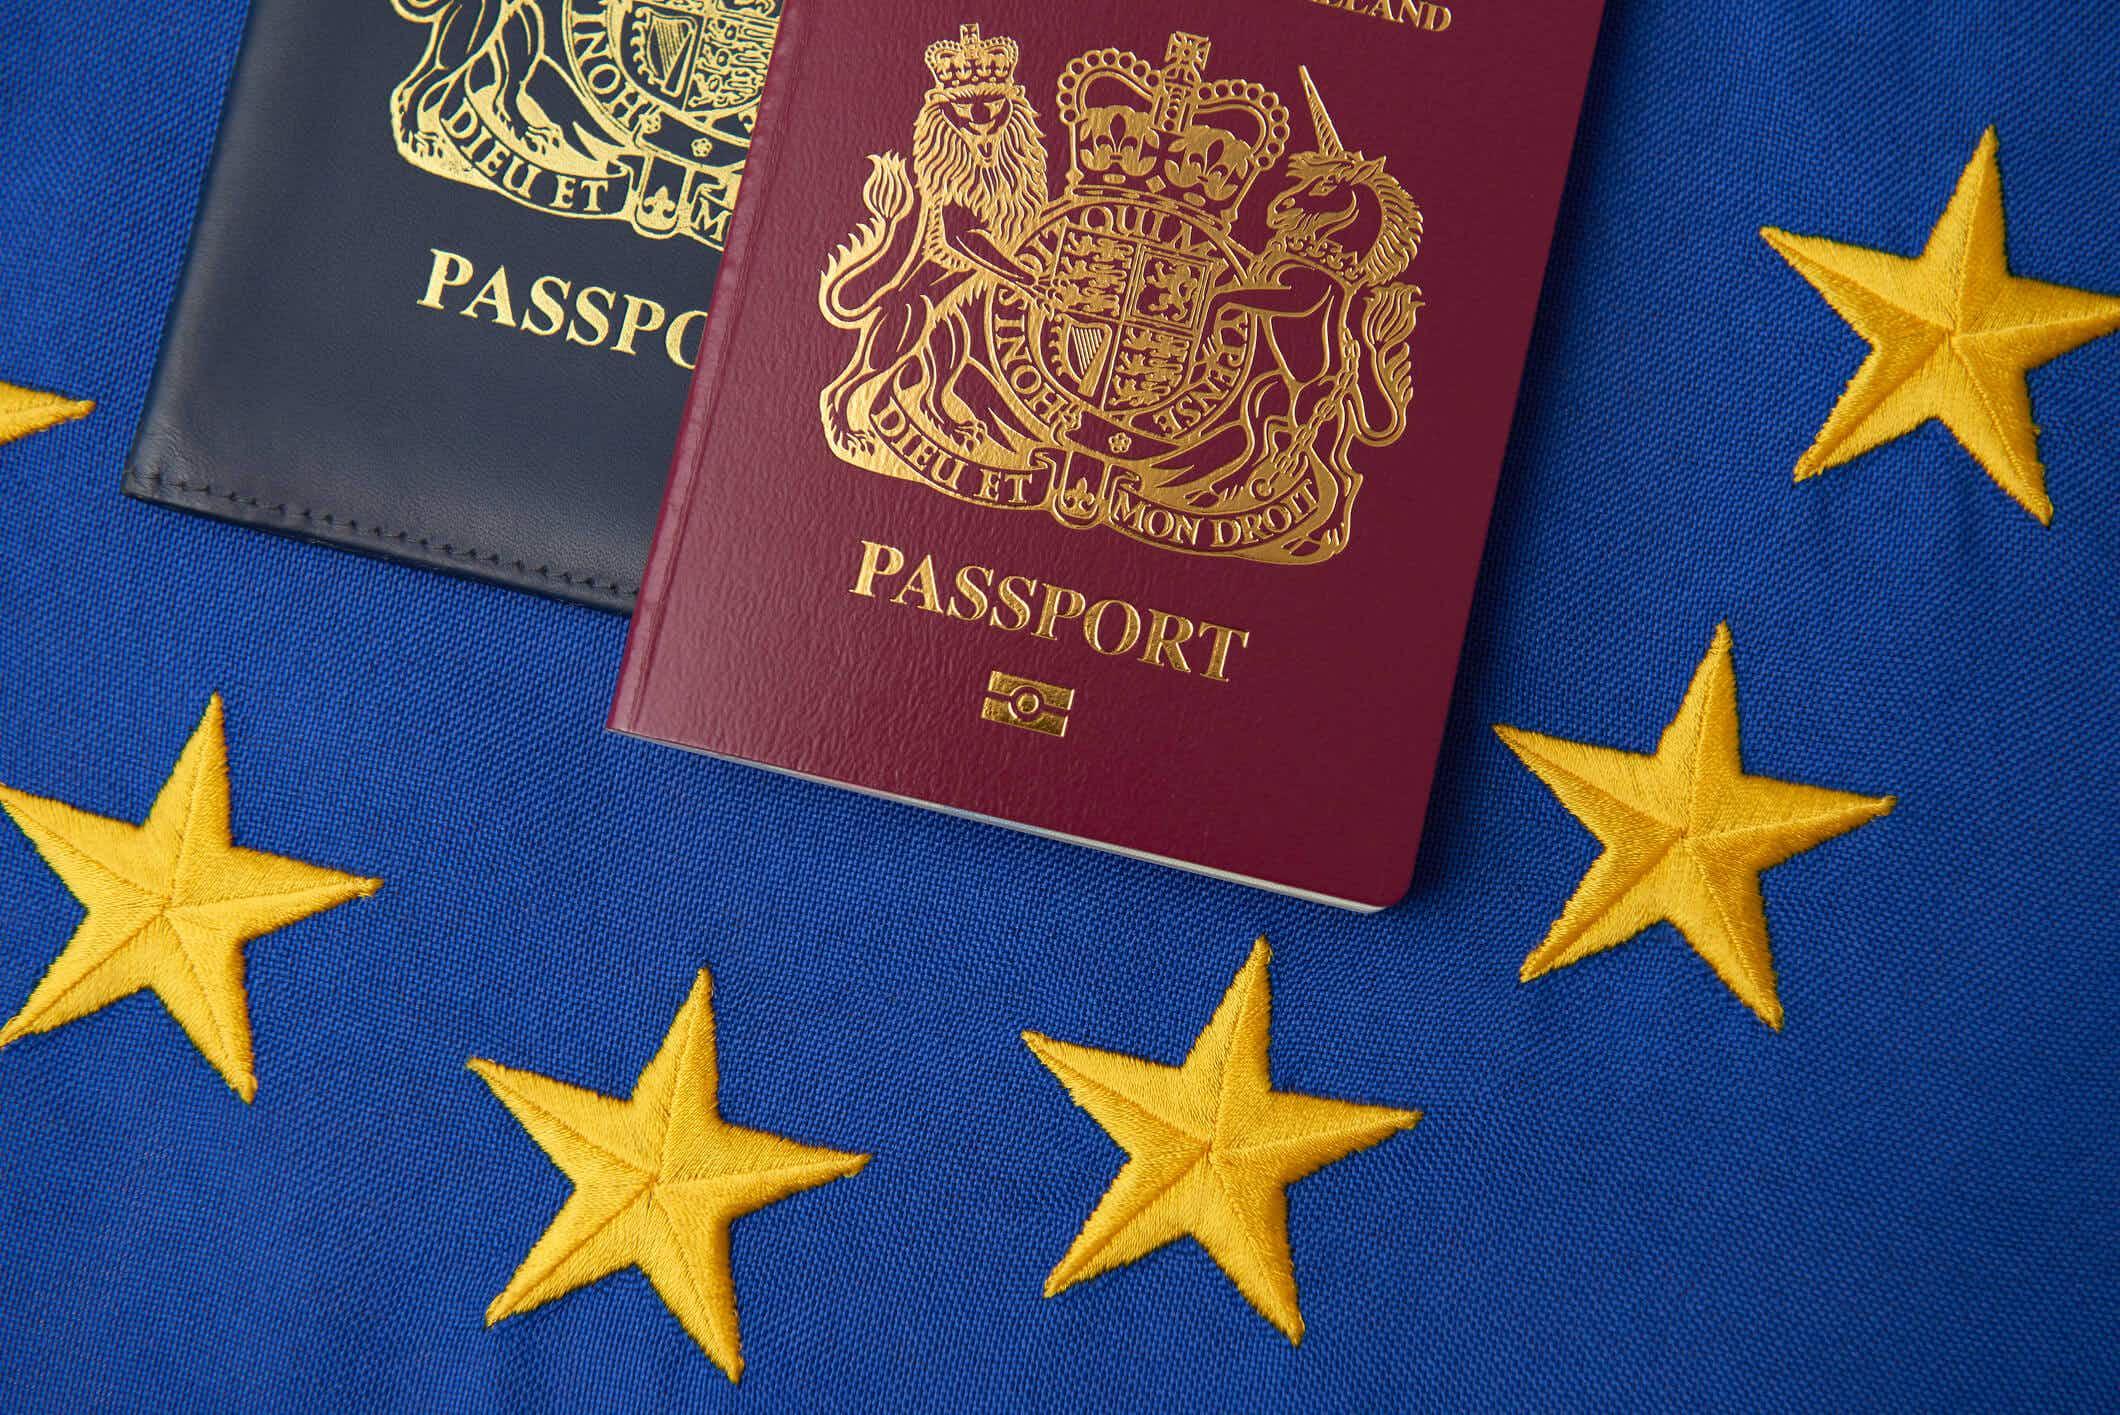 British passports may not be valid for upcoming holidays, warns the UK Passport Office